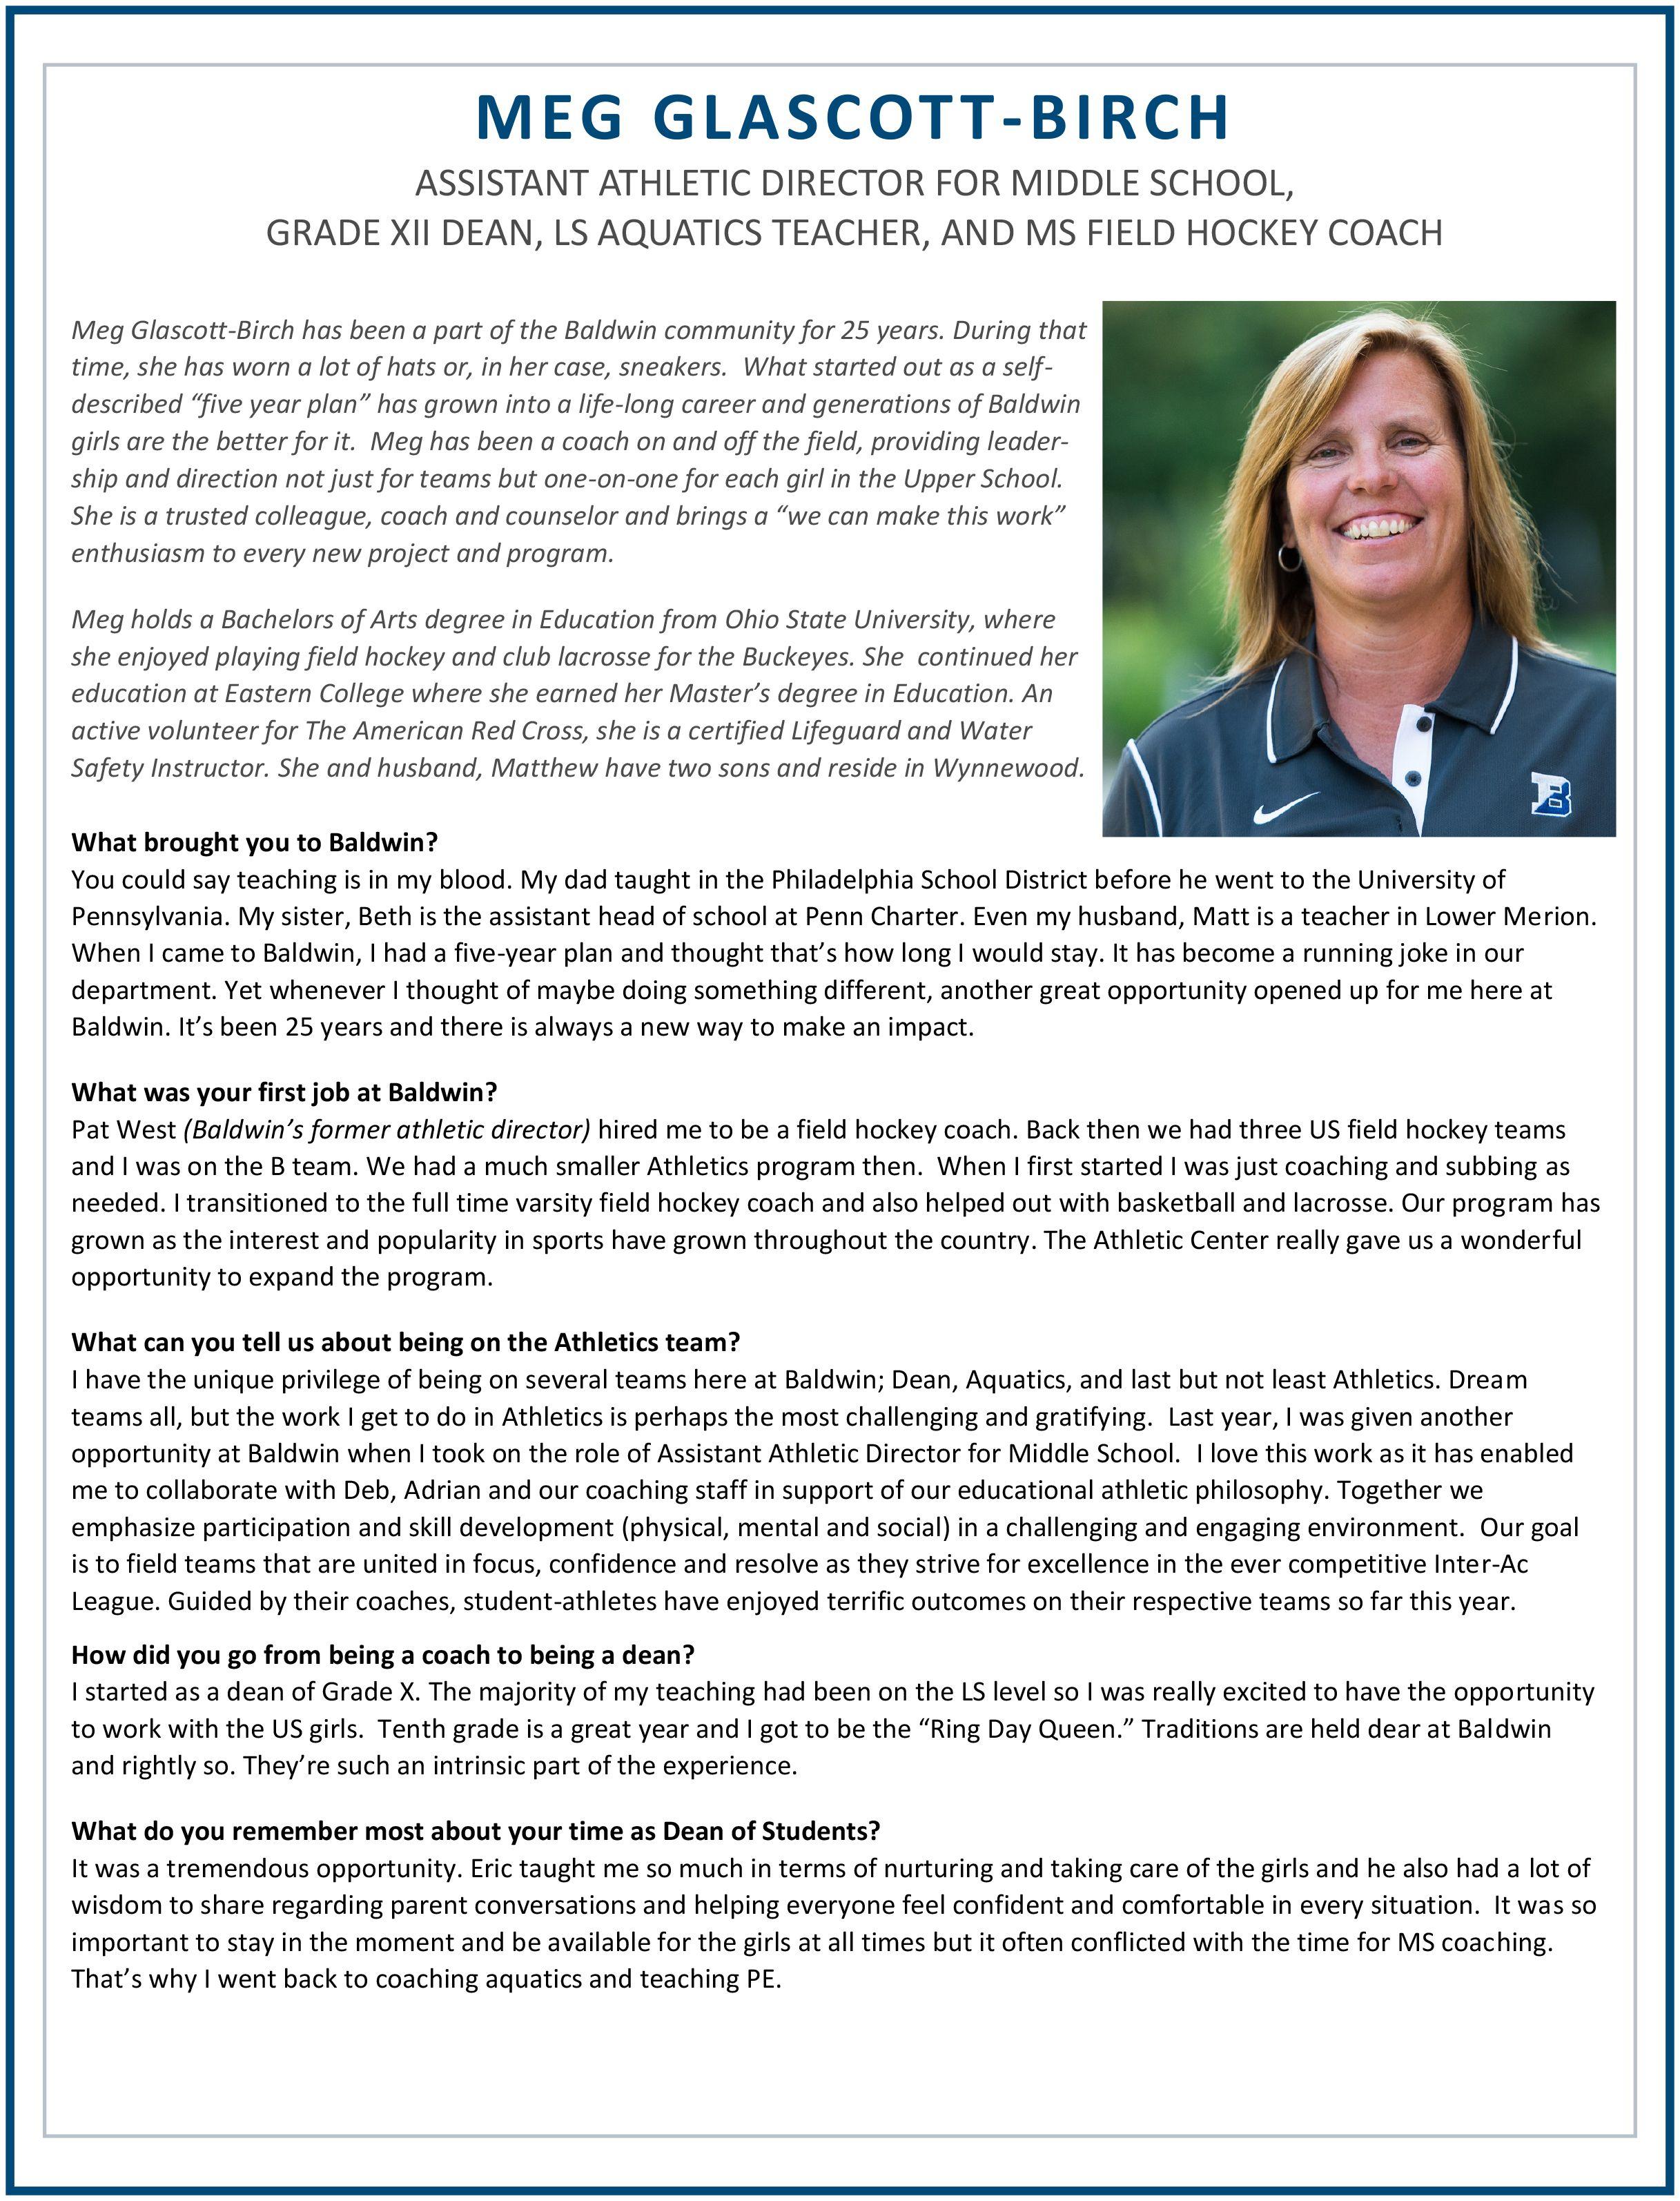 Meet Meg Glascott-Birch (front) | Faculty Profiles